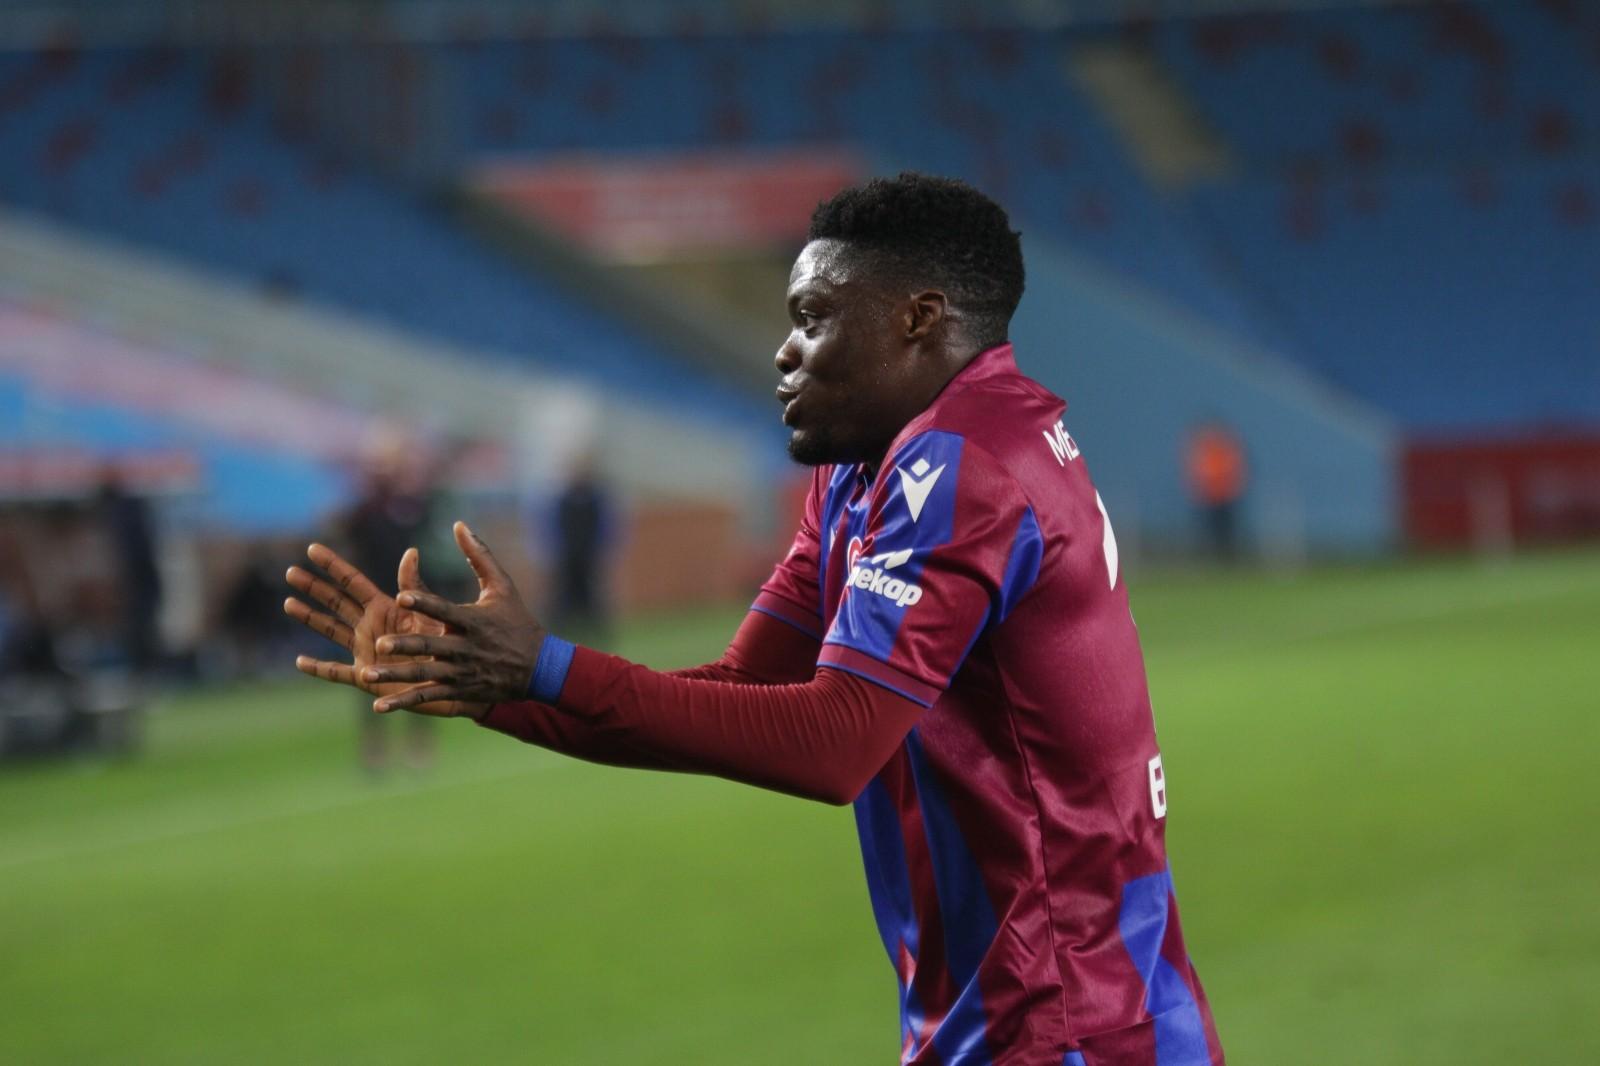 Süper Lig: Trabzonspor: 1 – Hes Kablo Kayserispor: 1 (Maç sonucu)